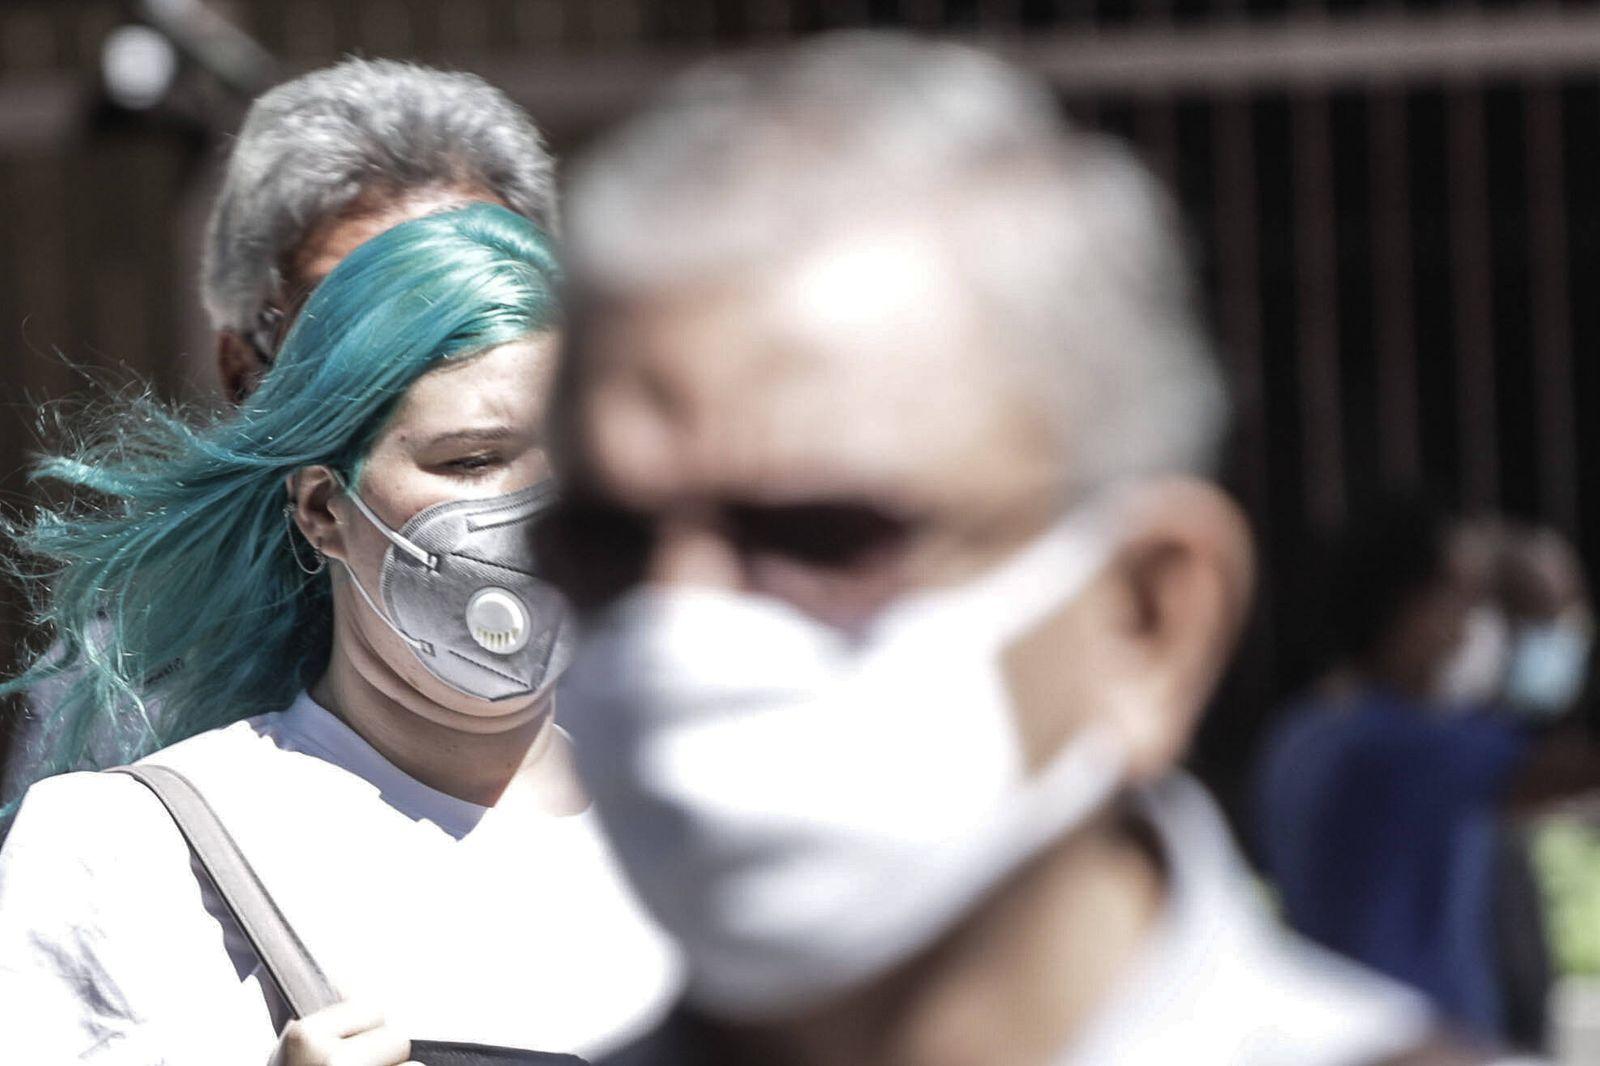 (210505) -- SAO PAULO, May 5, 2021 -- People wearing face masks walk on a street in Sao Paulo, Brazil, on May 4, 2021. B